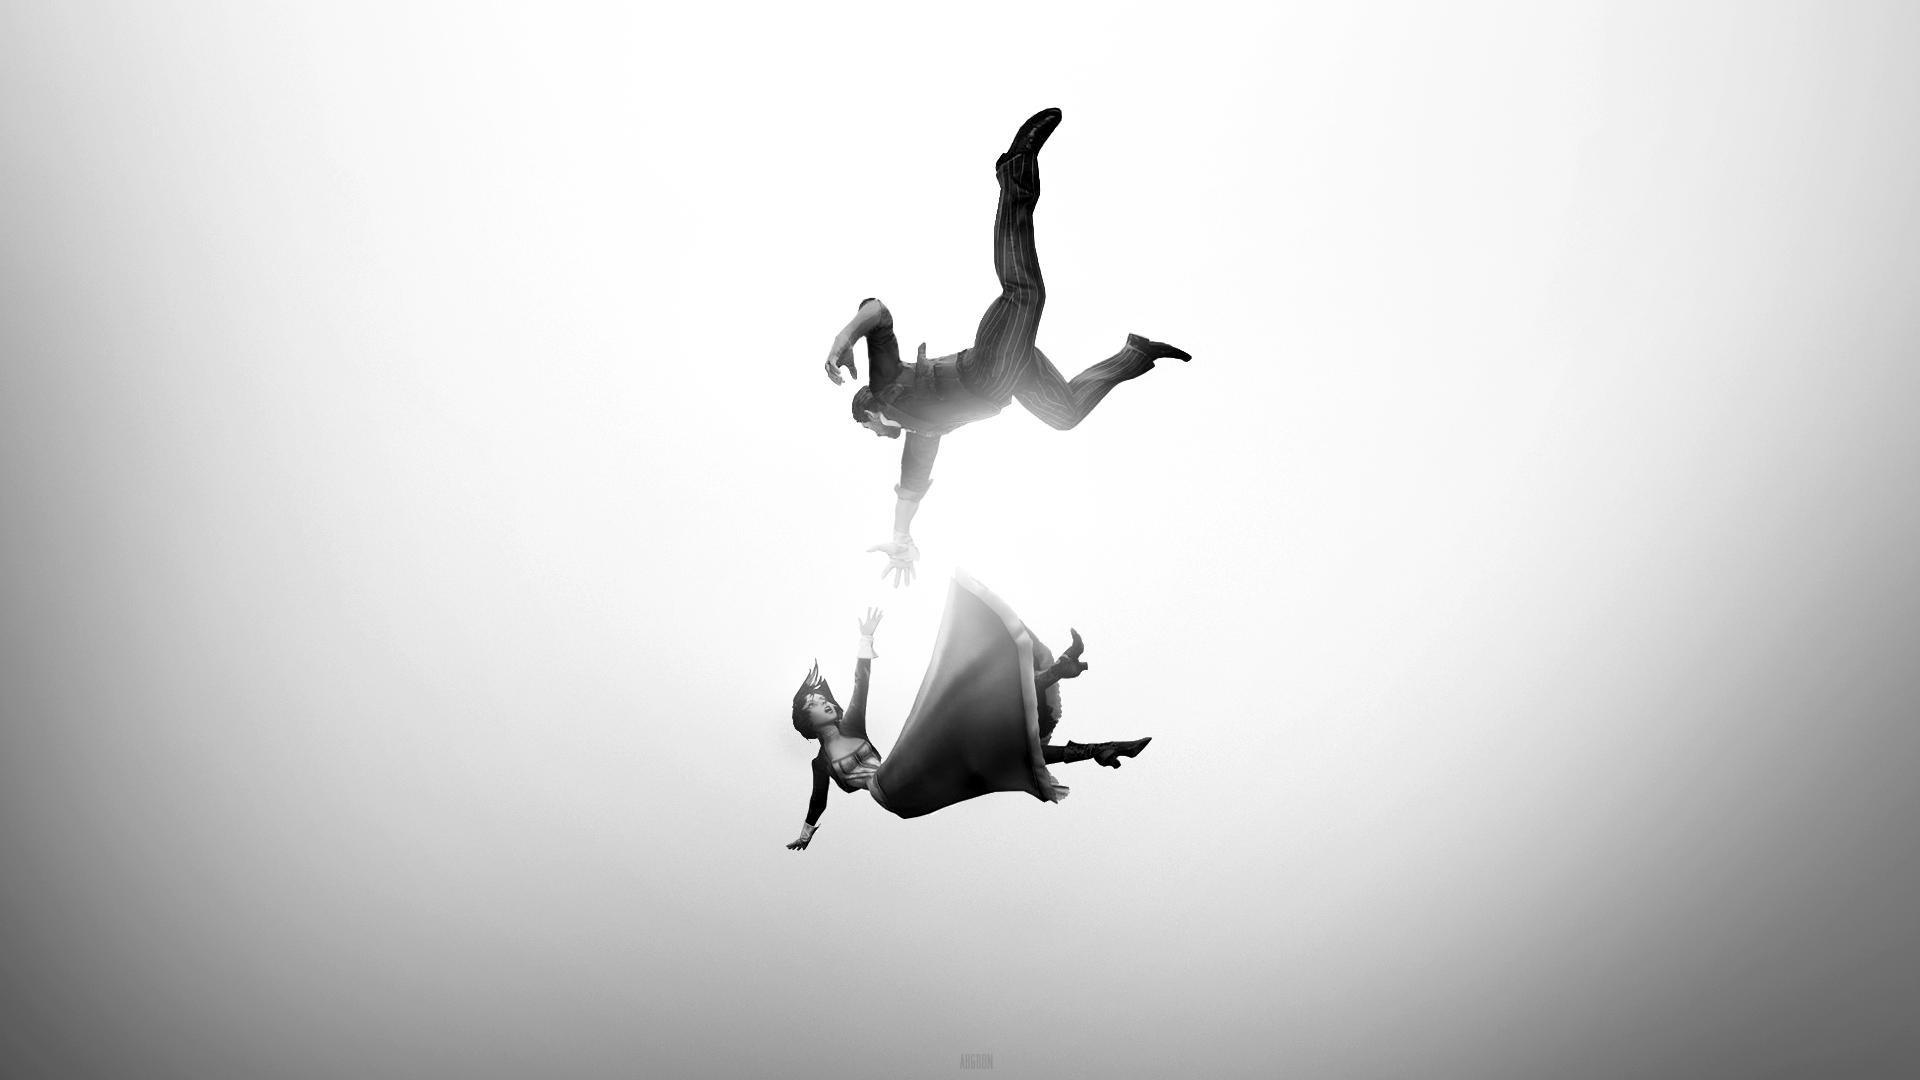 Bioshock Infinite Falling Wallpaper Hd Wallpaper Video Games Jumping Silhouette Falling